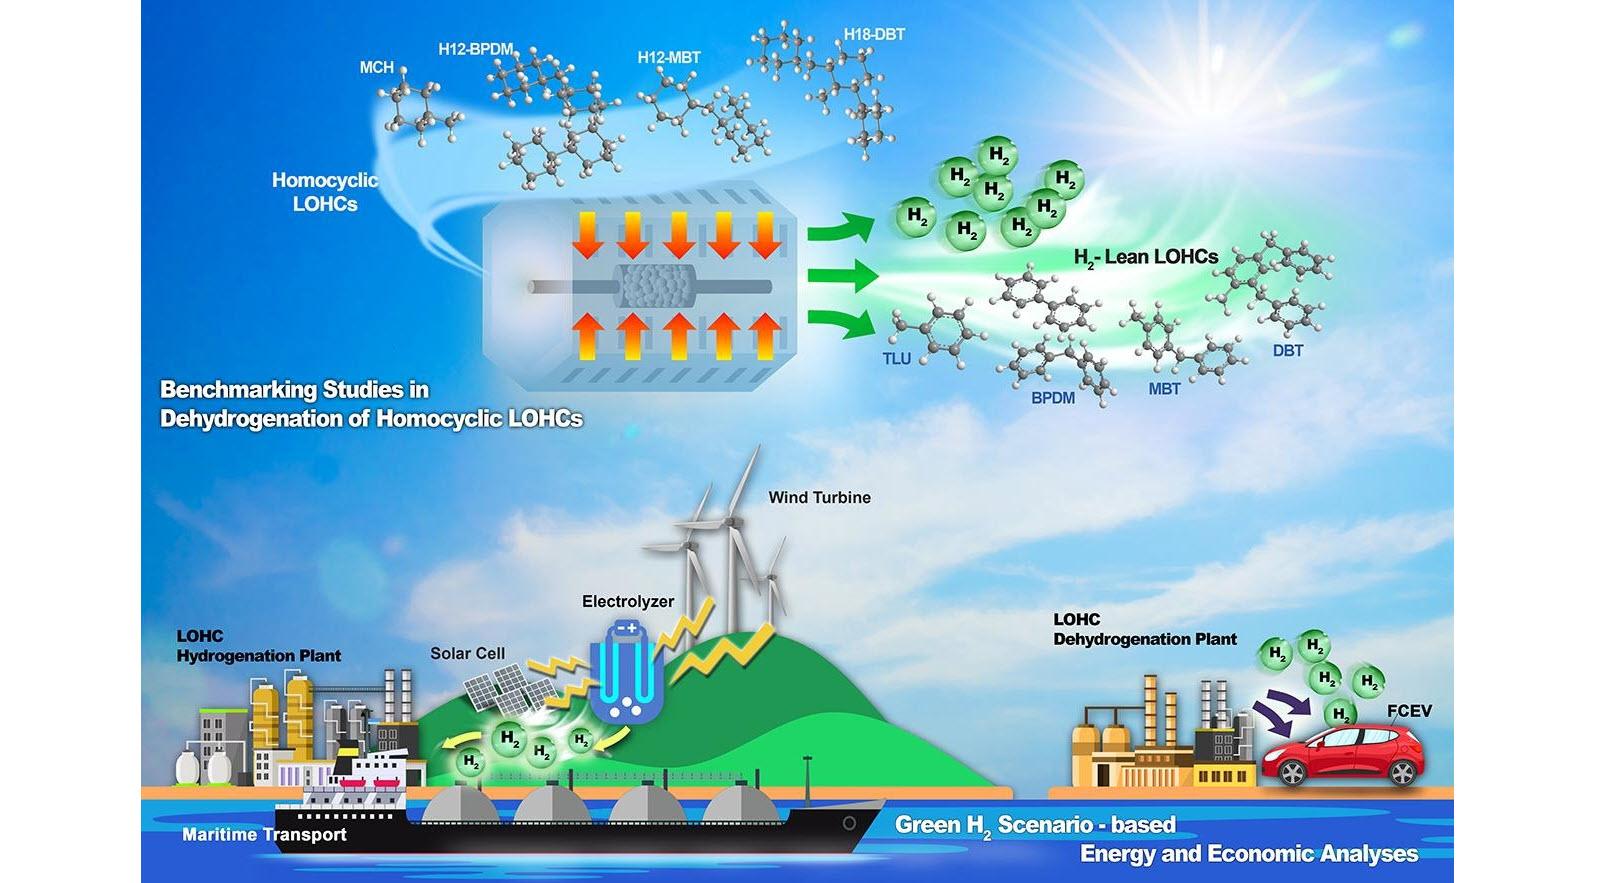 Fuel Cells Works, Korea: KIST Researchers Finding Chemical Carrier Option for Hydrogen Storage